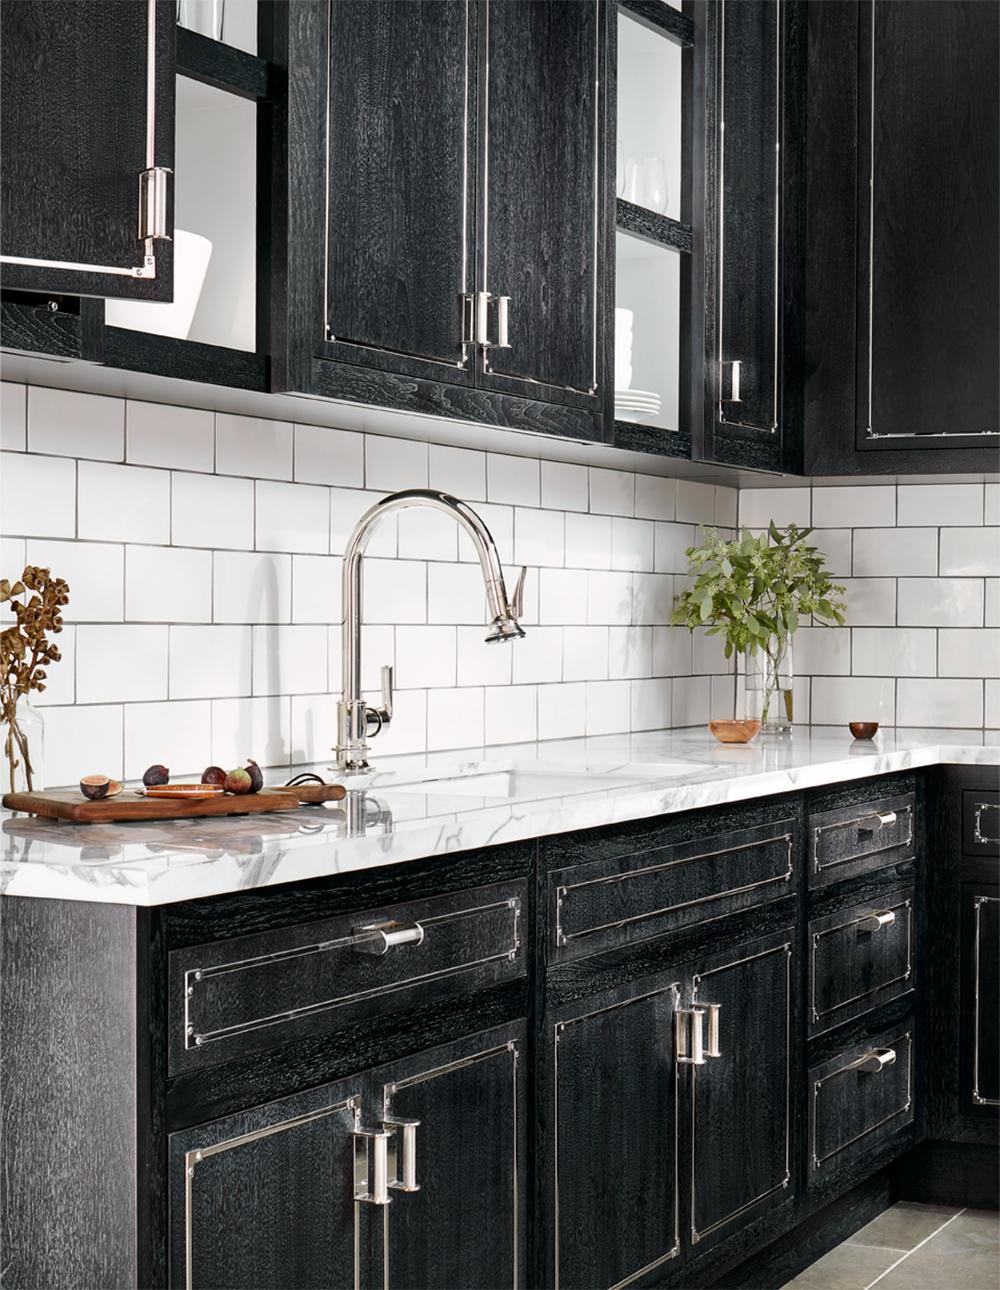 Cabinetry Collections Waterworks Waterworks Pulls Hardware In 2020 Metal Kitchen Cabinets Kitchen Design Kitchen Design Open